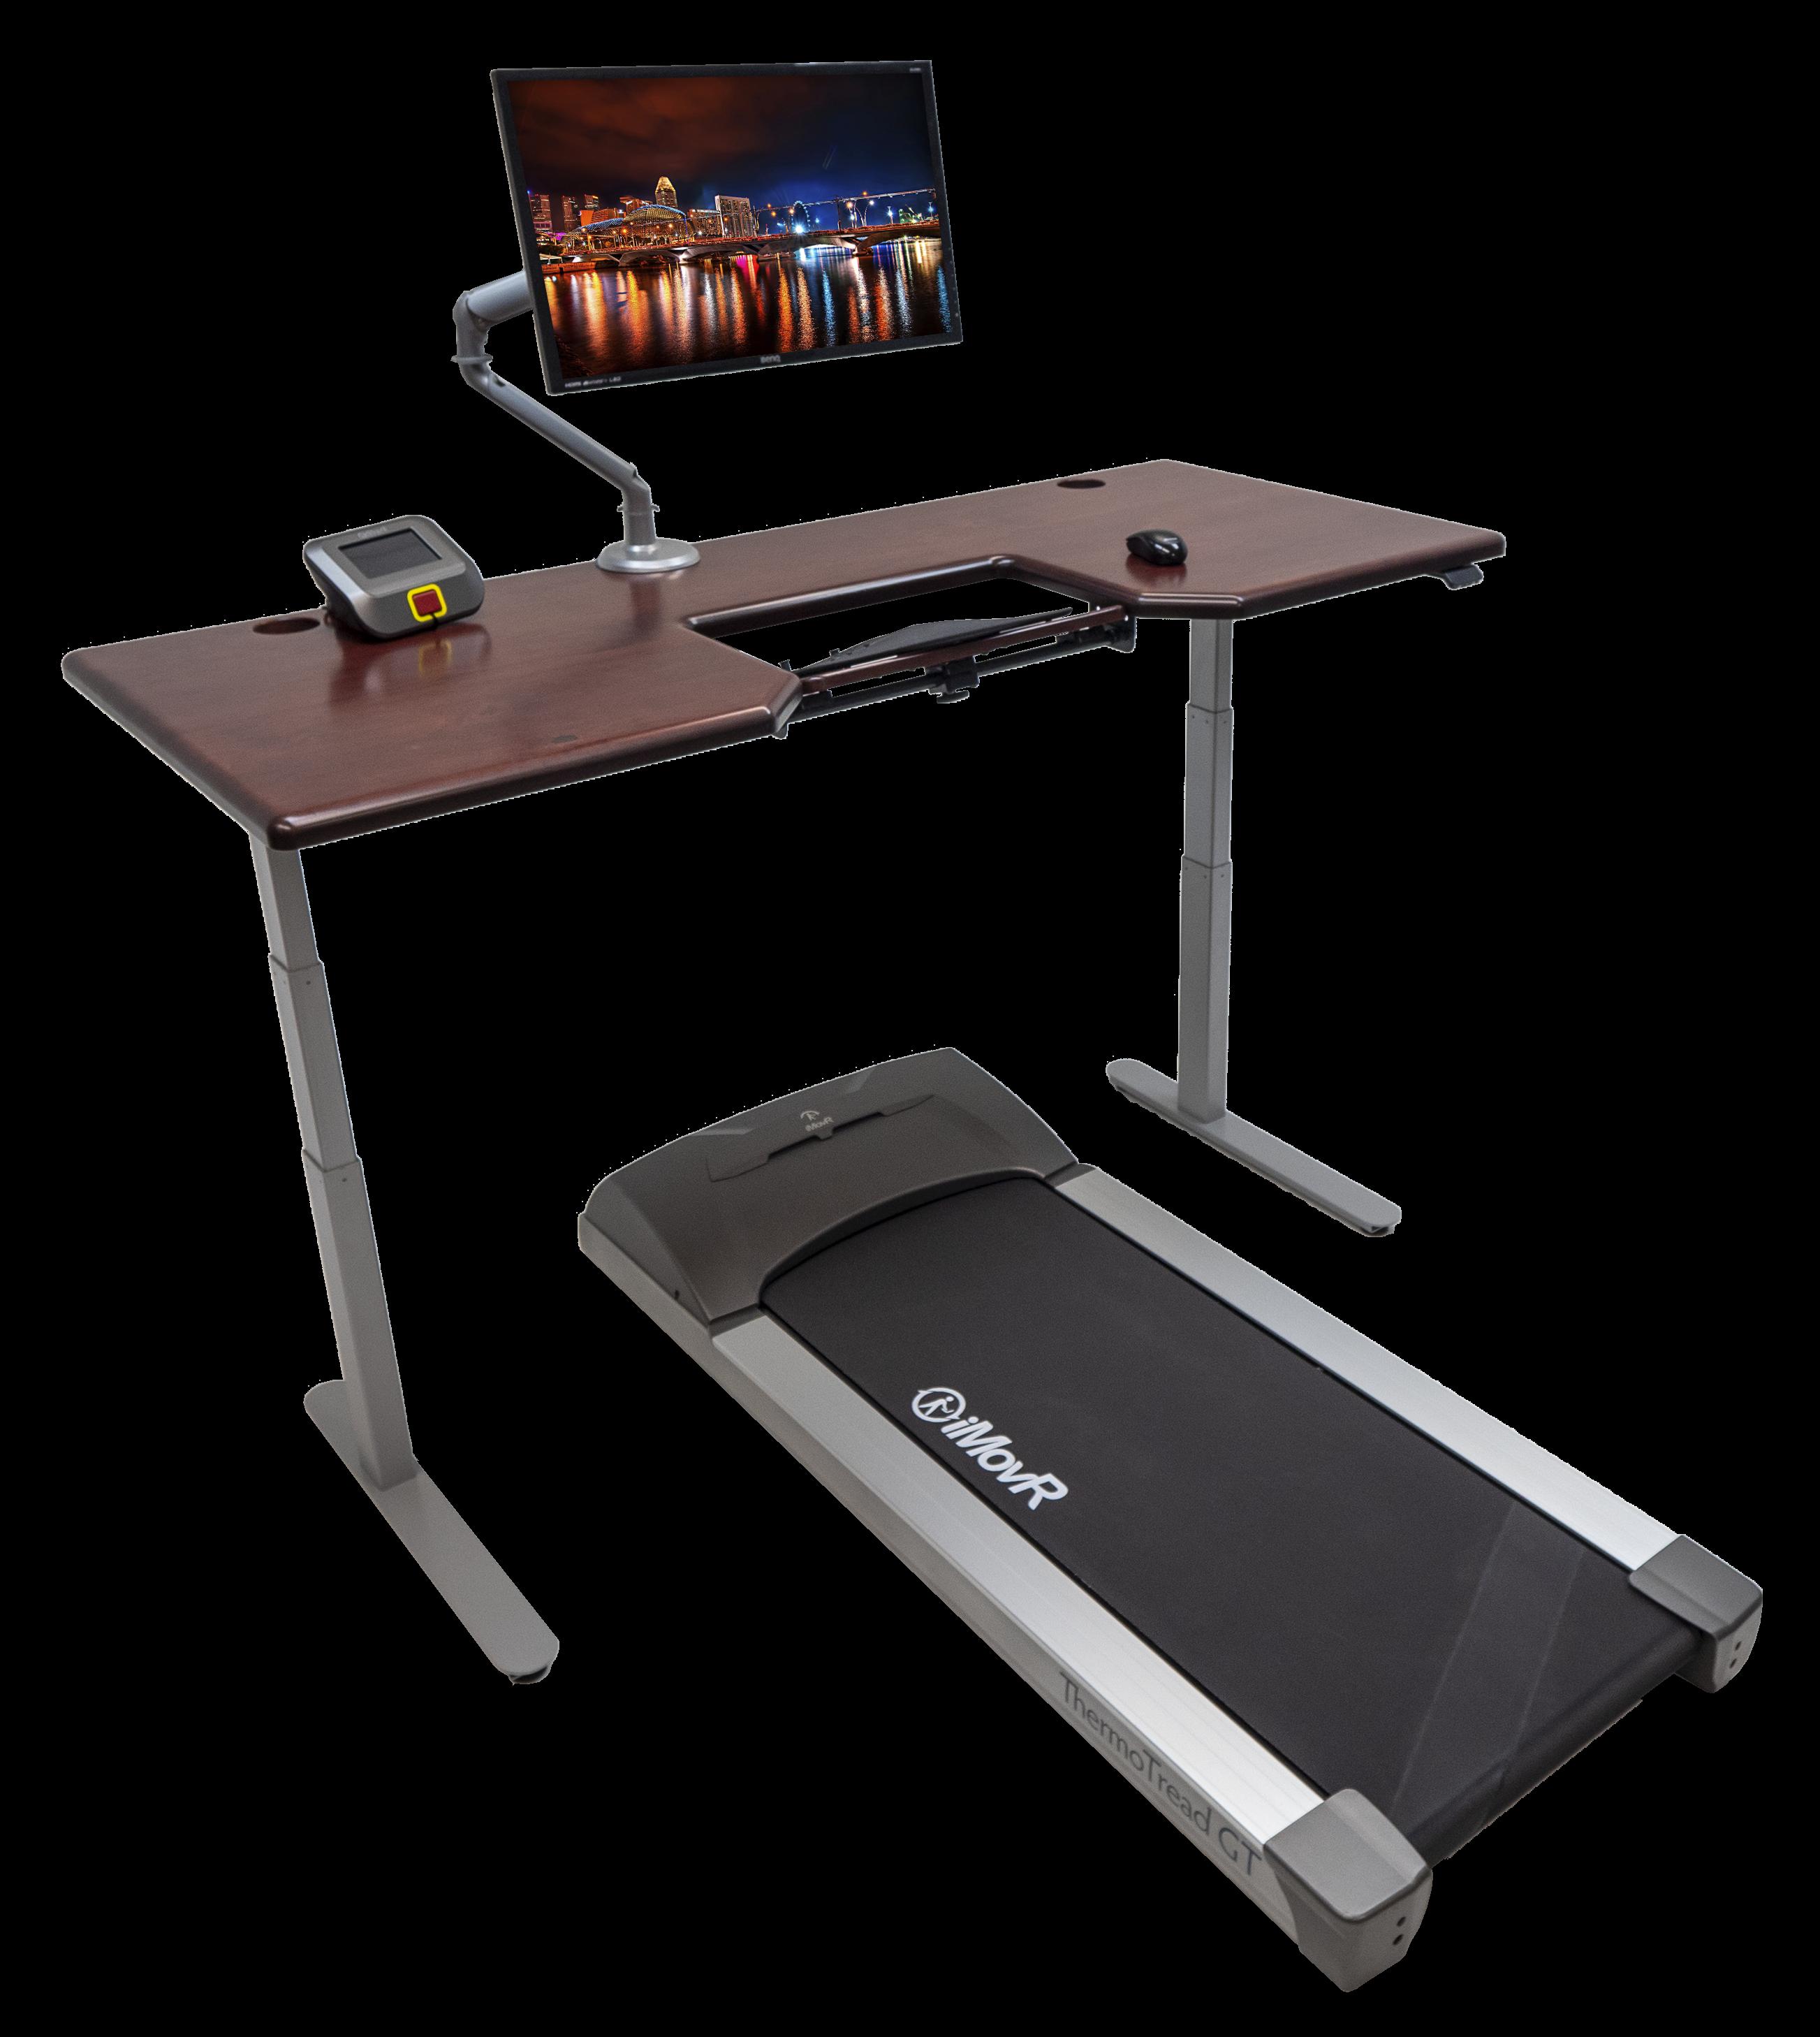 iMovR Lander Treadmill Desk with SteadyType